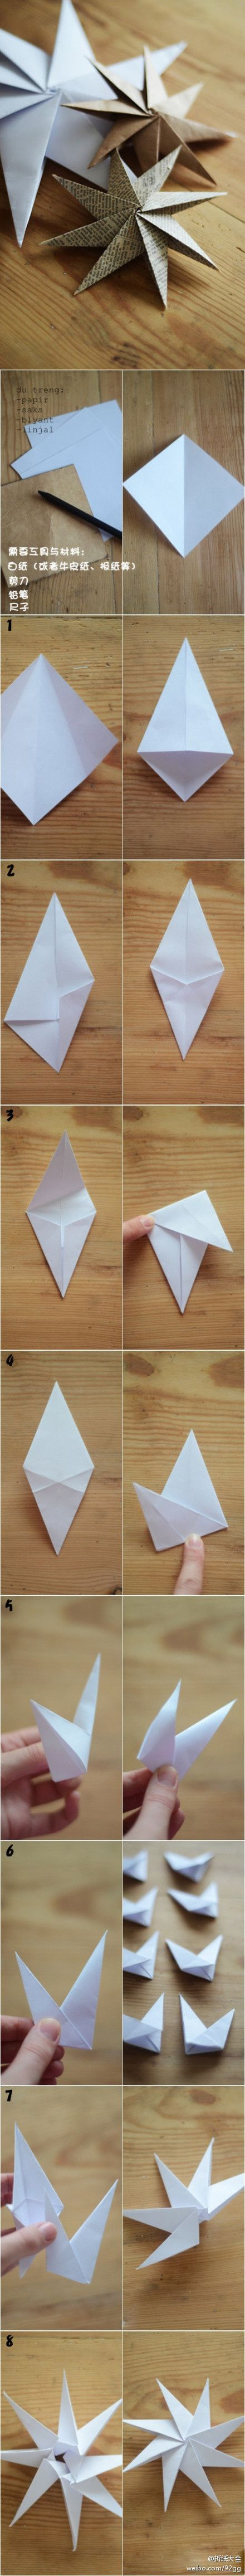 Grande estrela de papel octogonal